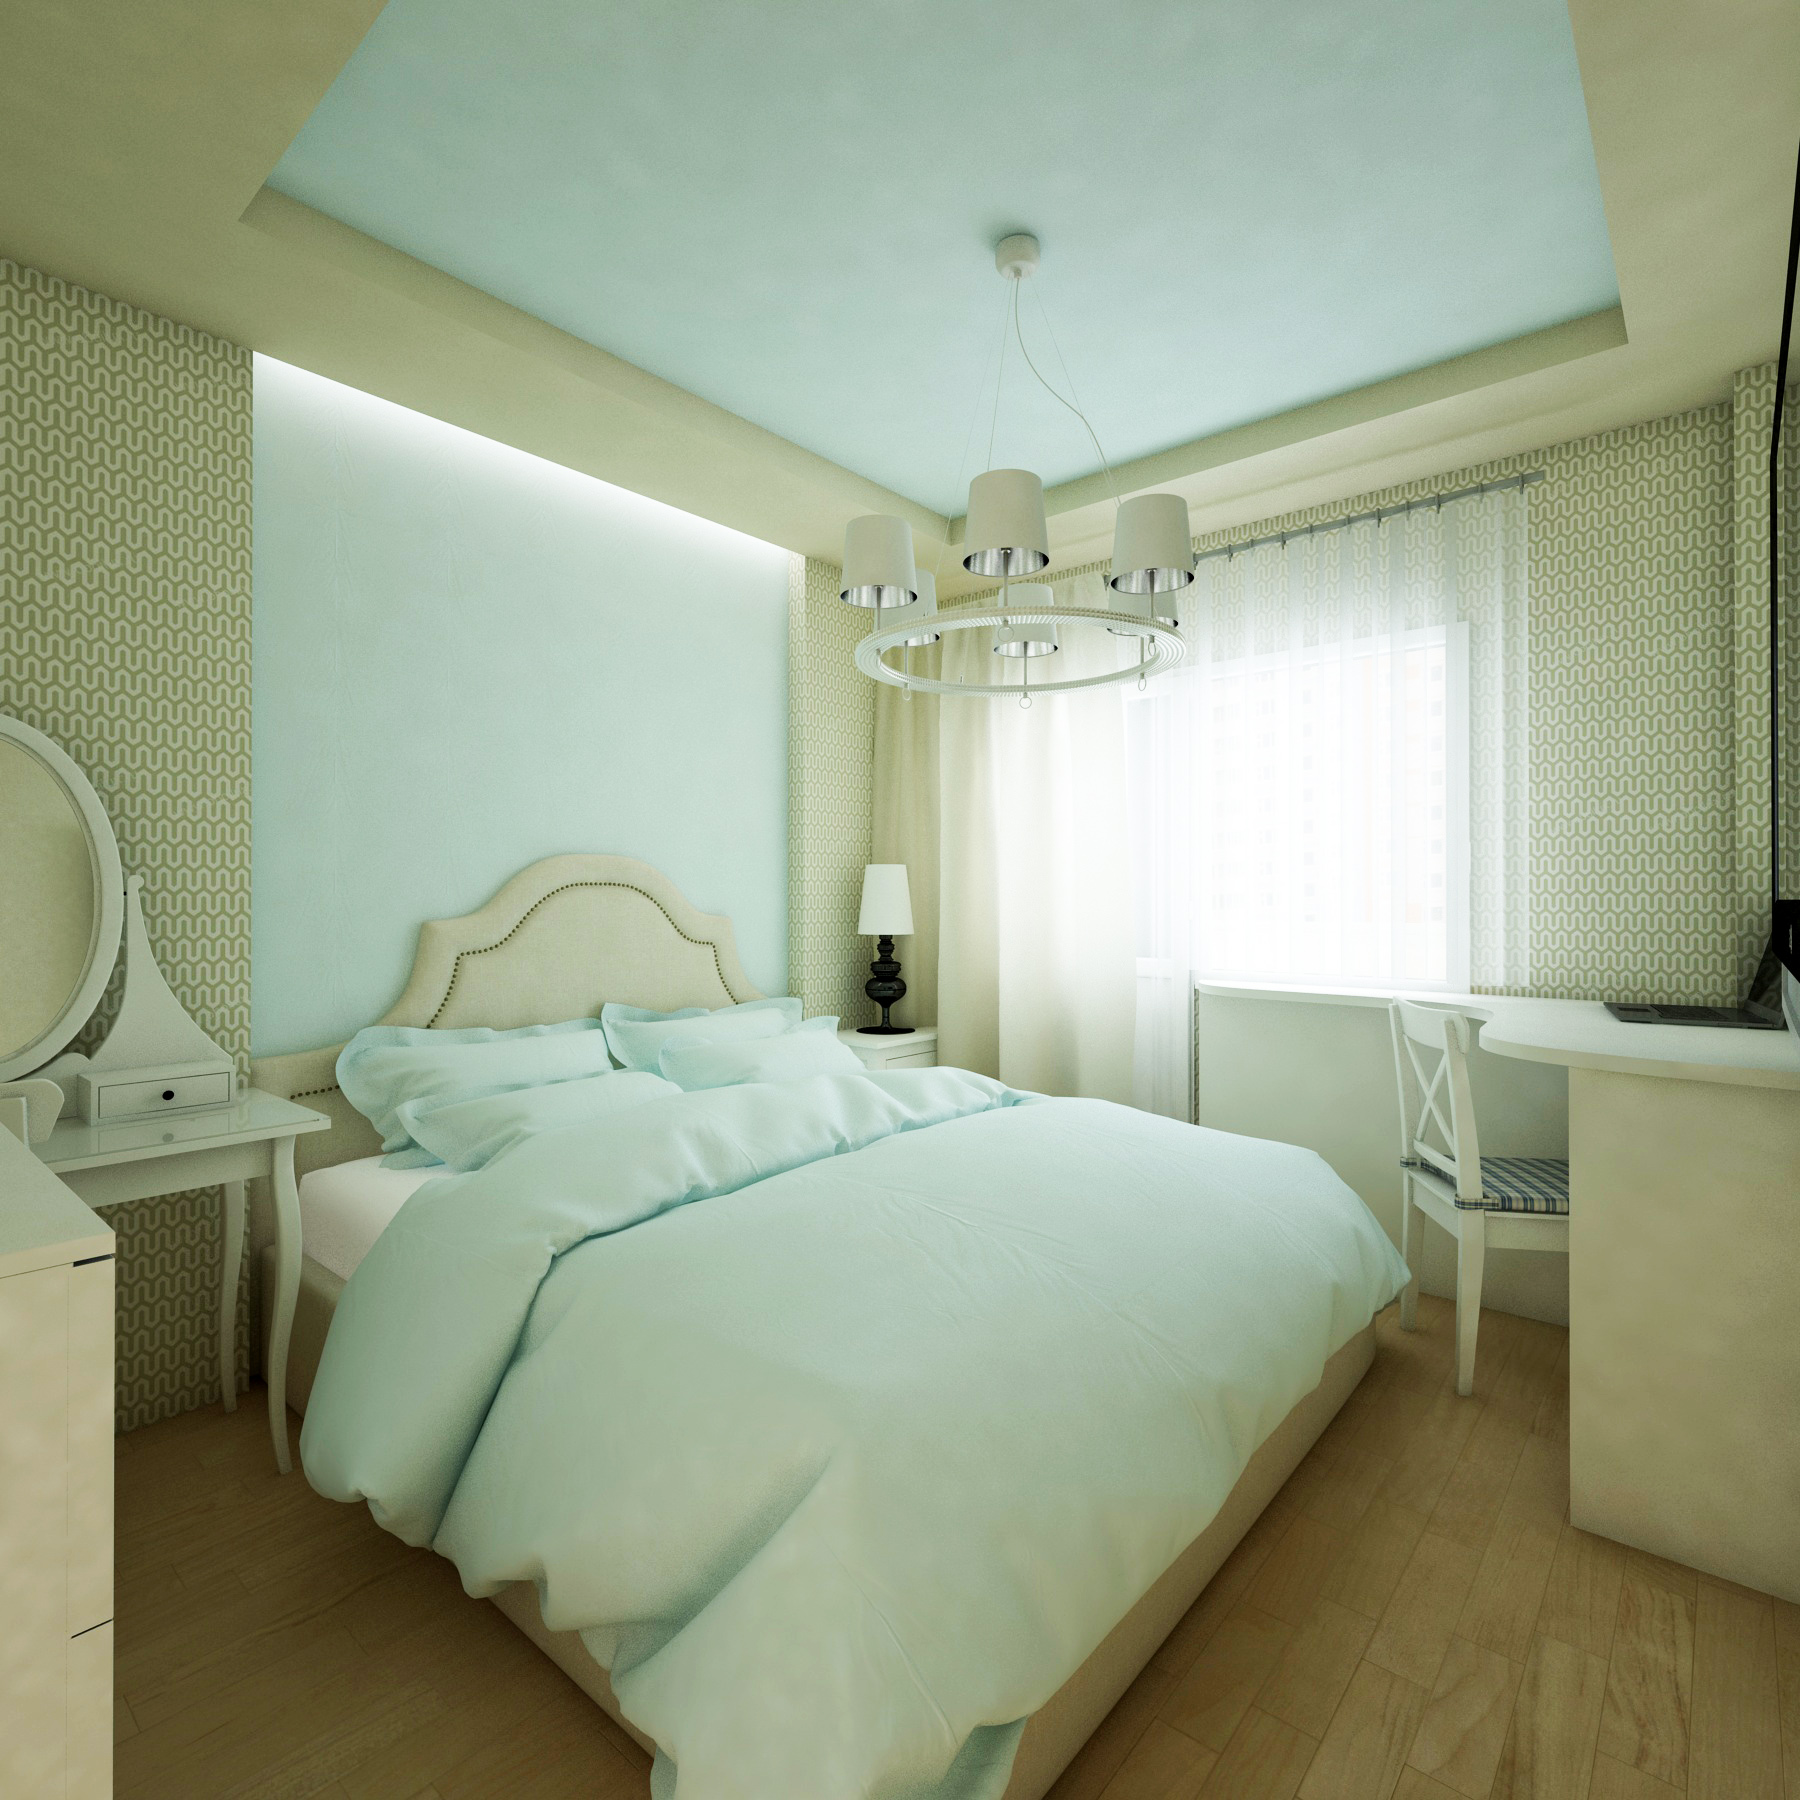 Спальня. Вариант 3